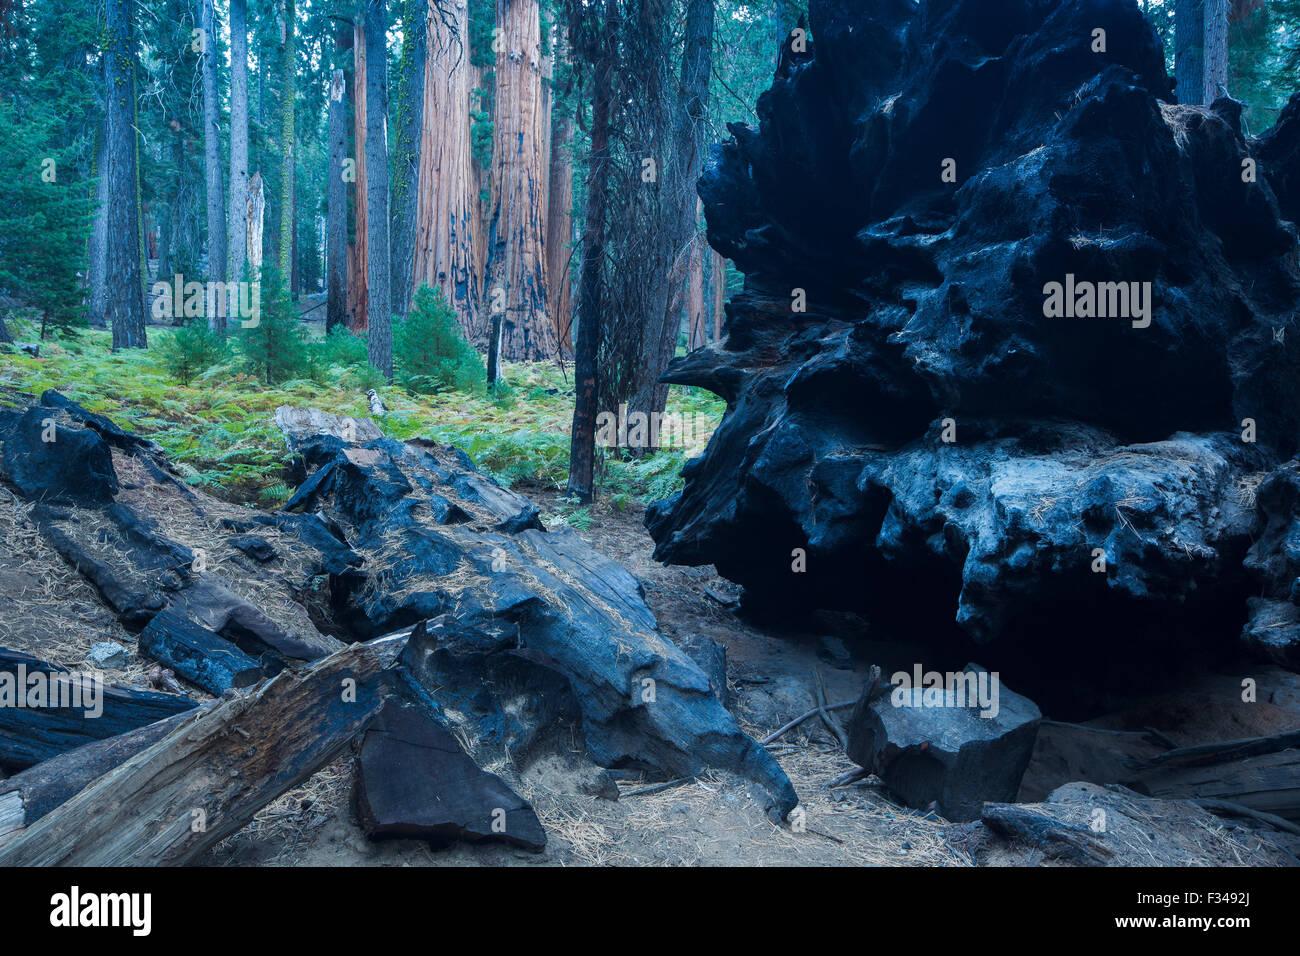 a fallen giant sequoia tree, Sequoia National Park, California, USA - Stock Image